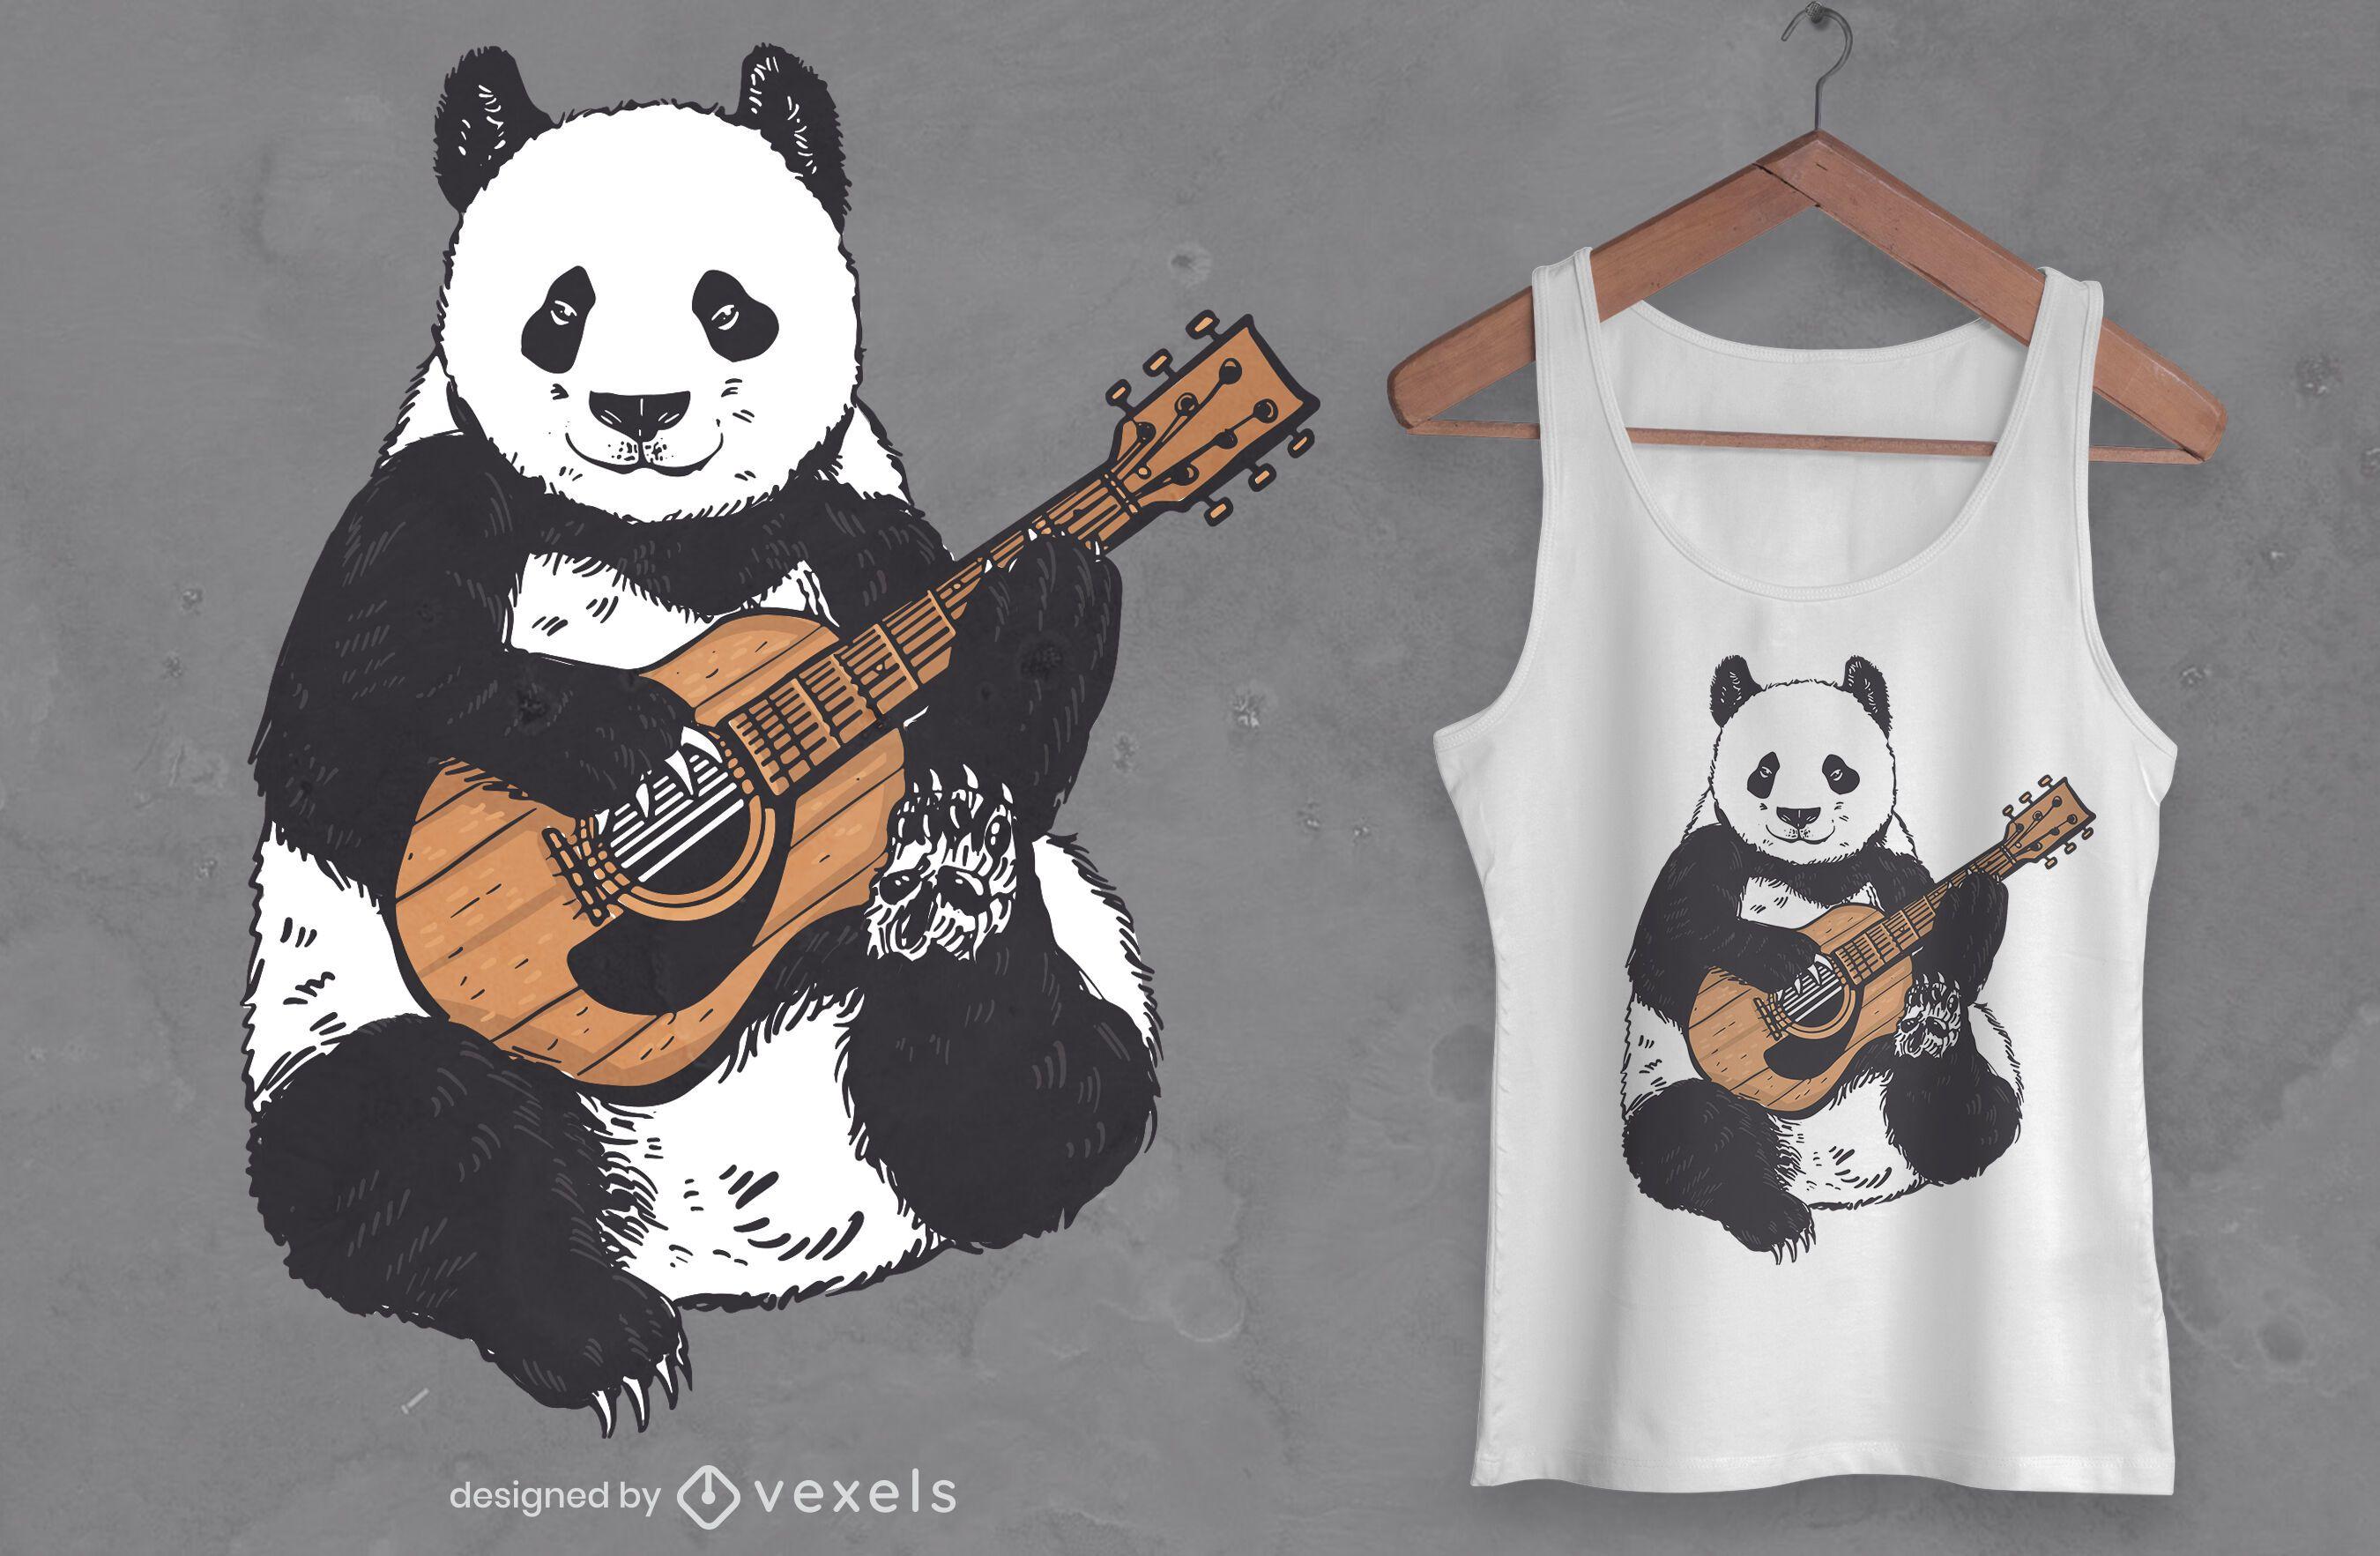 Guitar panda t-shirt design